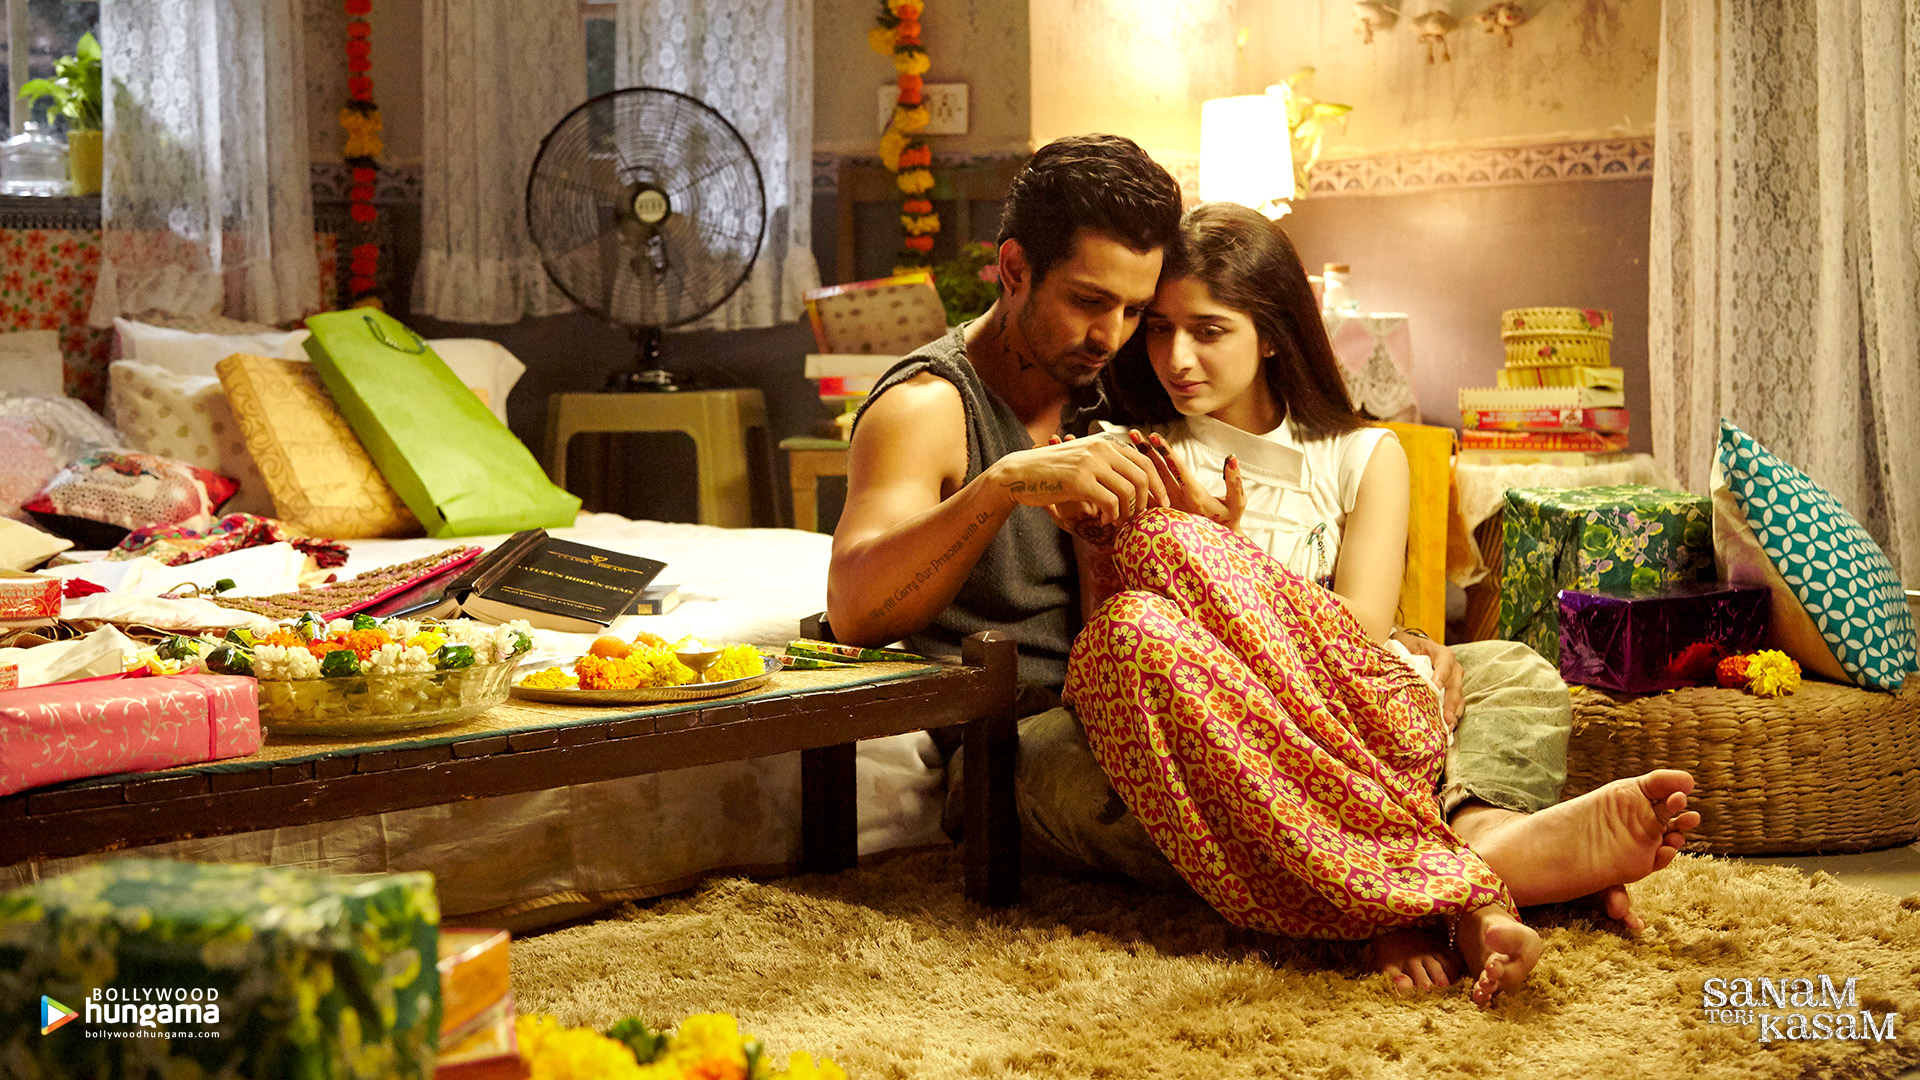 Sanam Teri Kasam Hq Movie Wallpapers Sanam Teri Kasam Hd: Sanam Teri Kasam 2016 Wallpapers